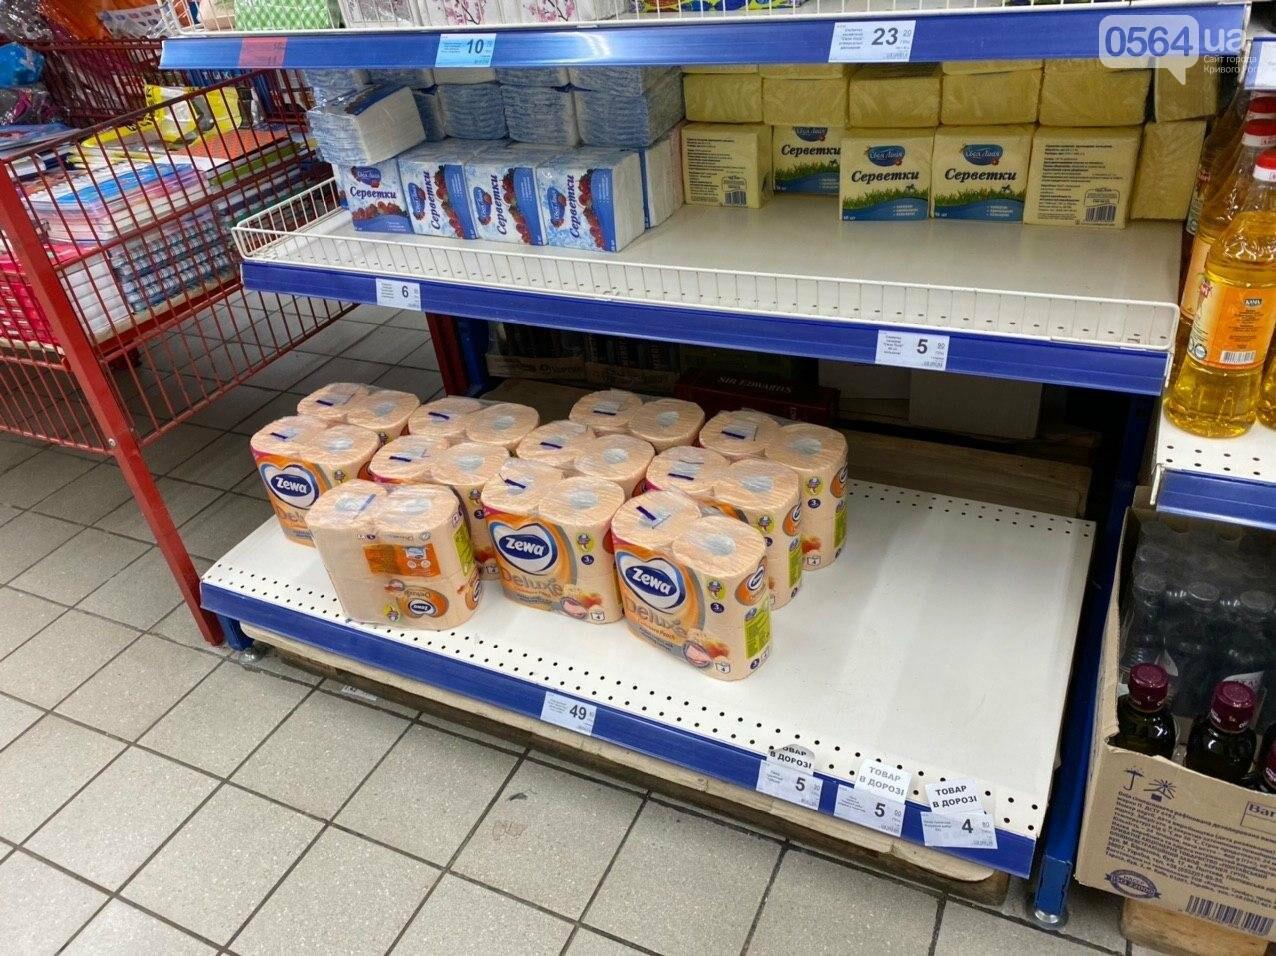 Туалетная бумага и гречка: что скупают криворожане во время карантина, - ФОТО , фото-1